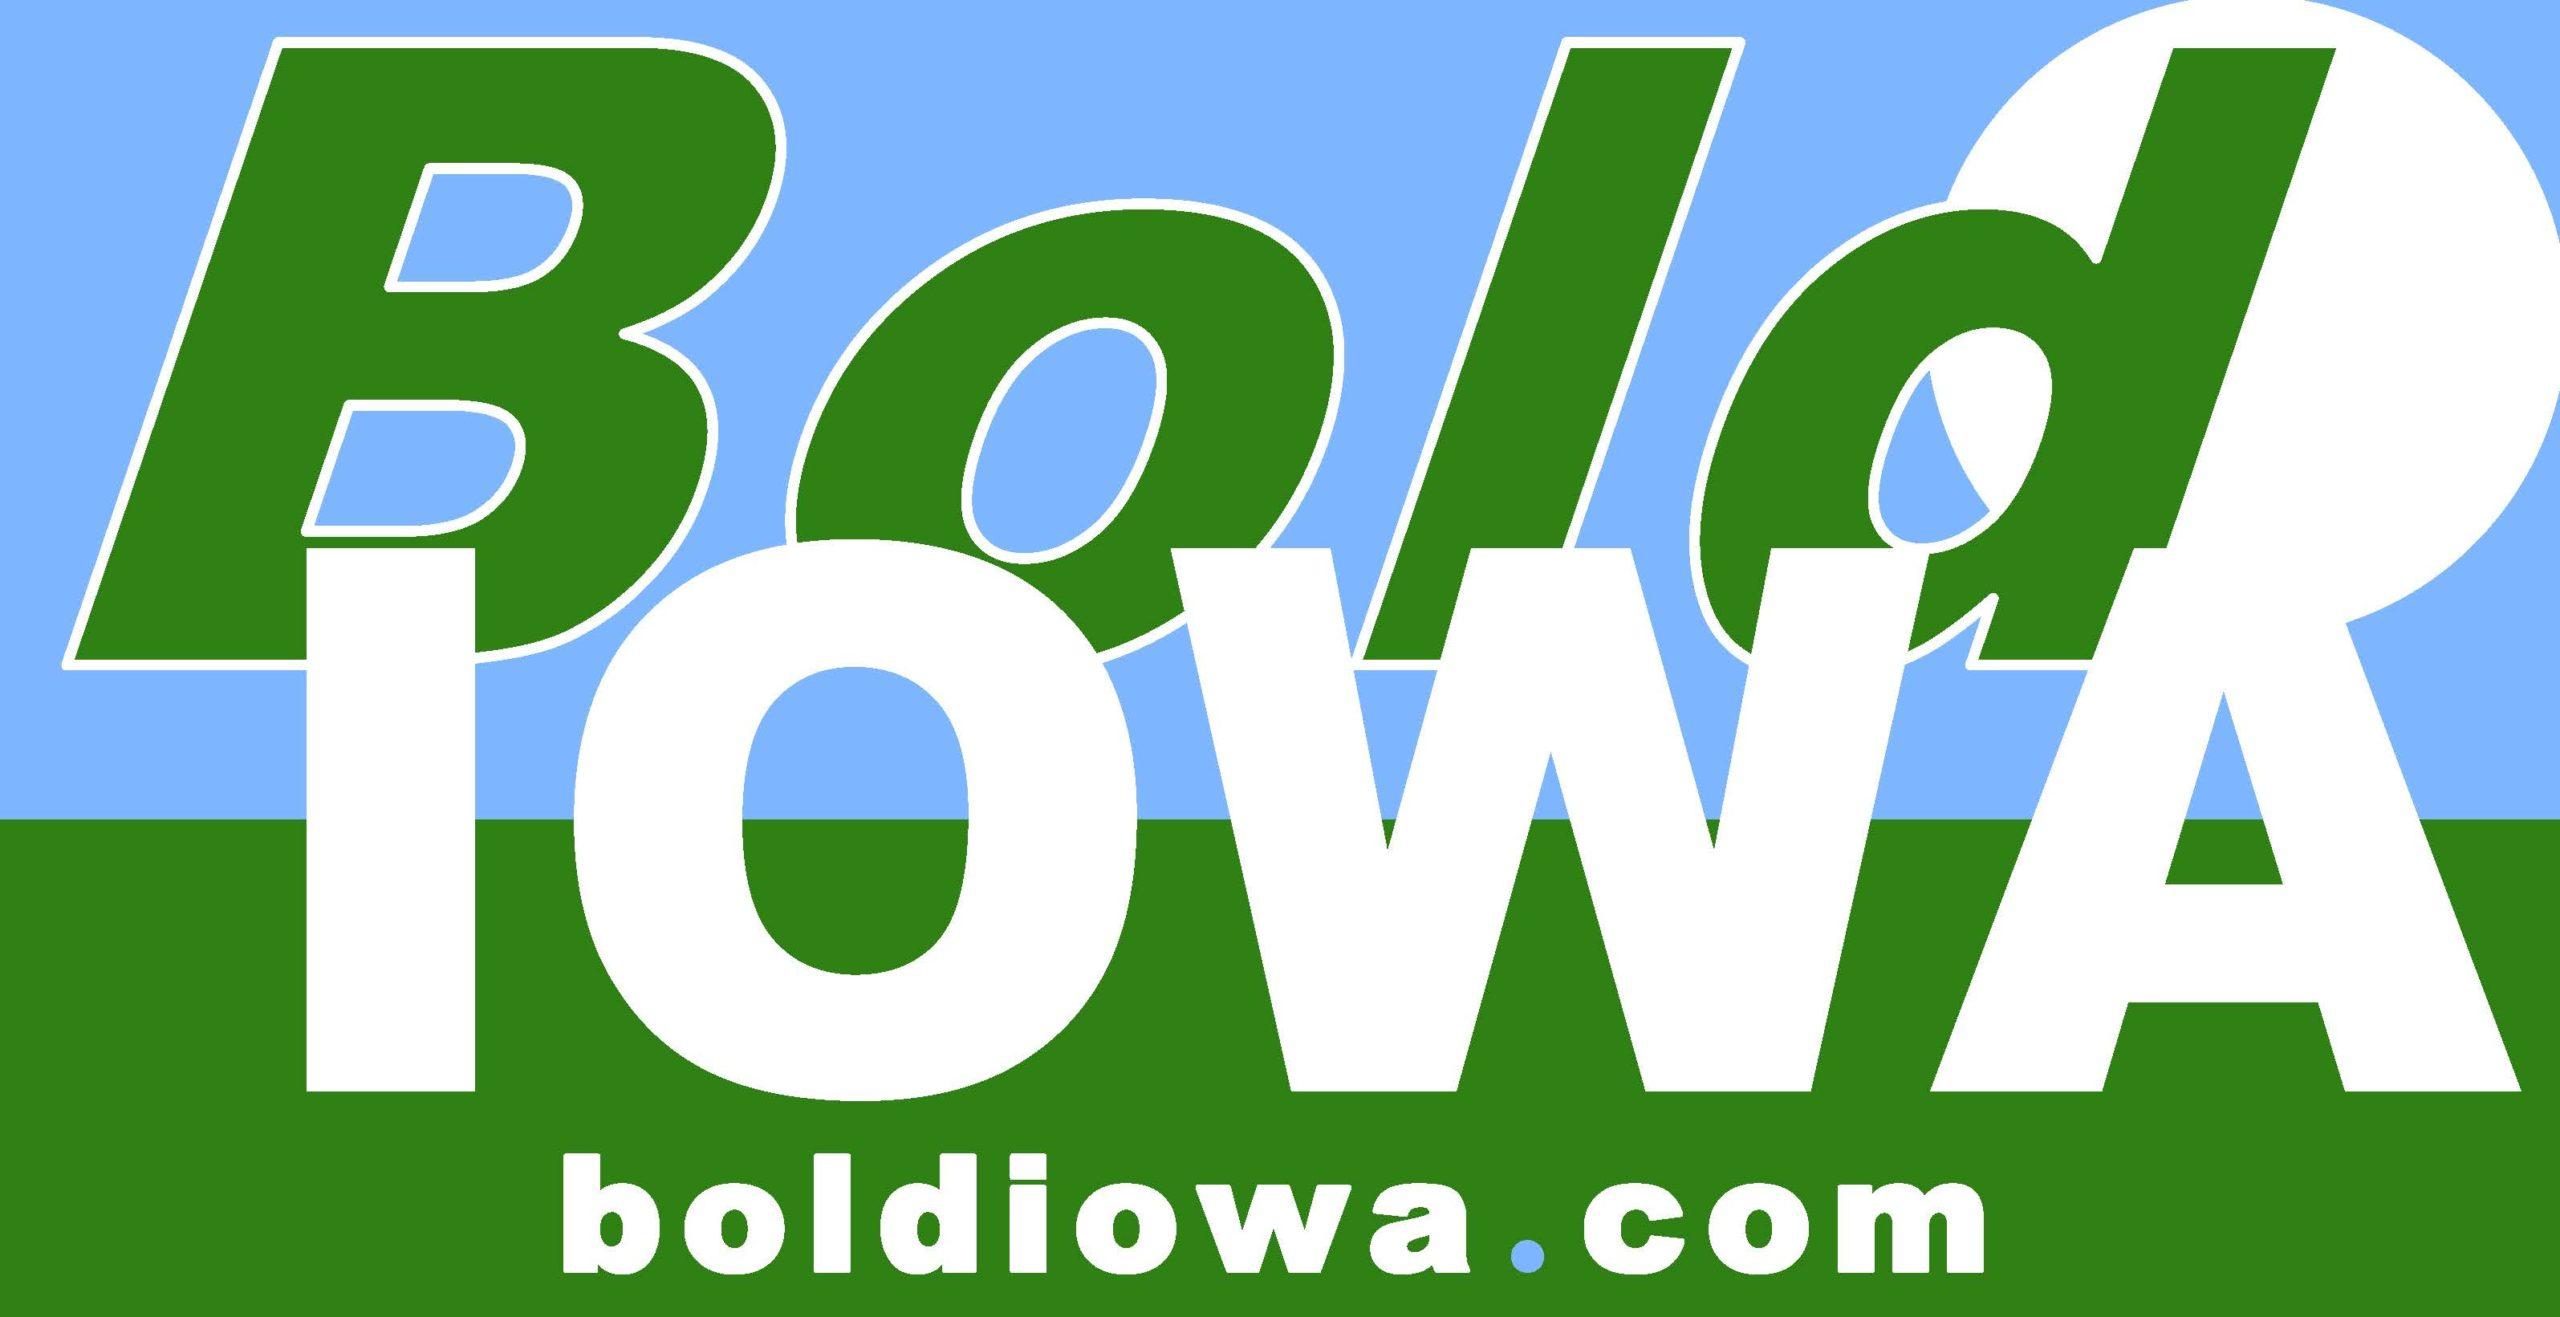 The REAL Bold Iowa